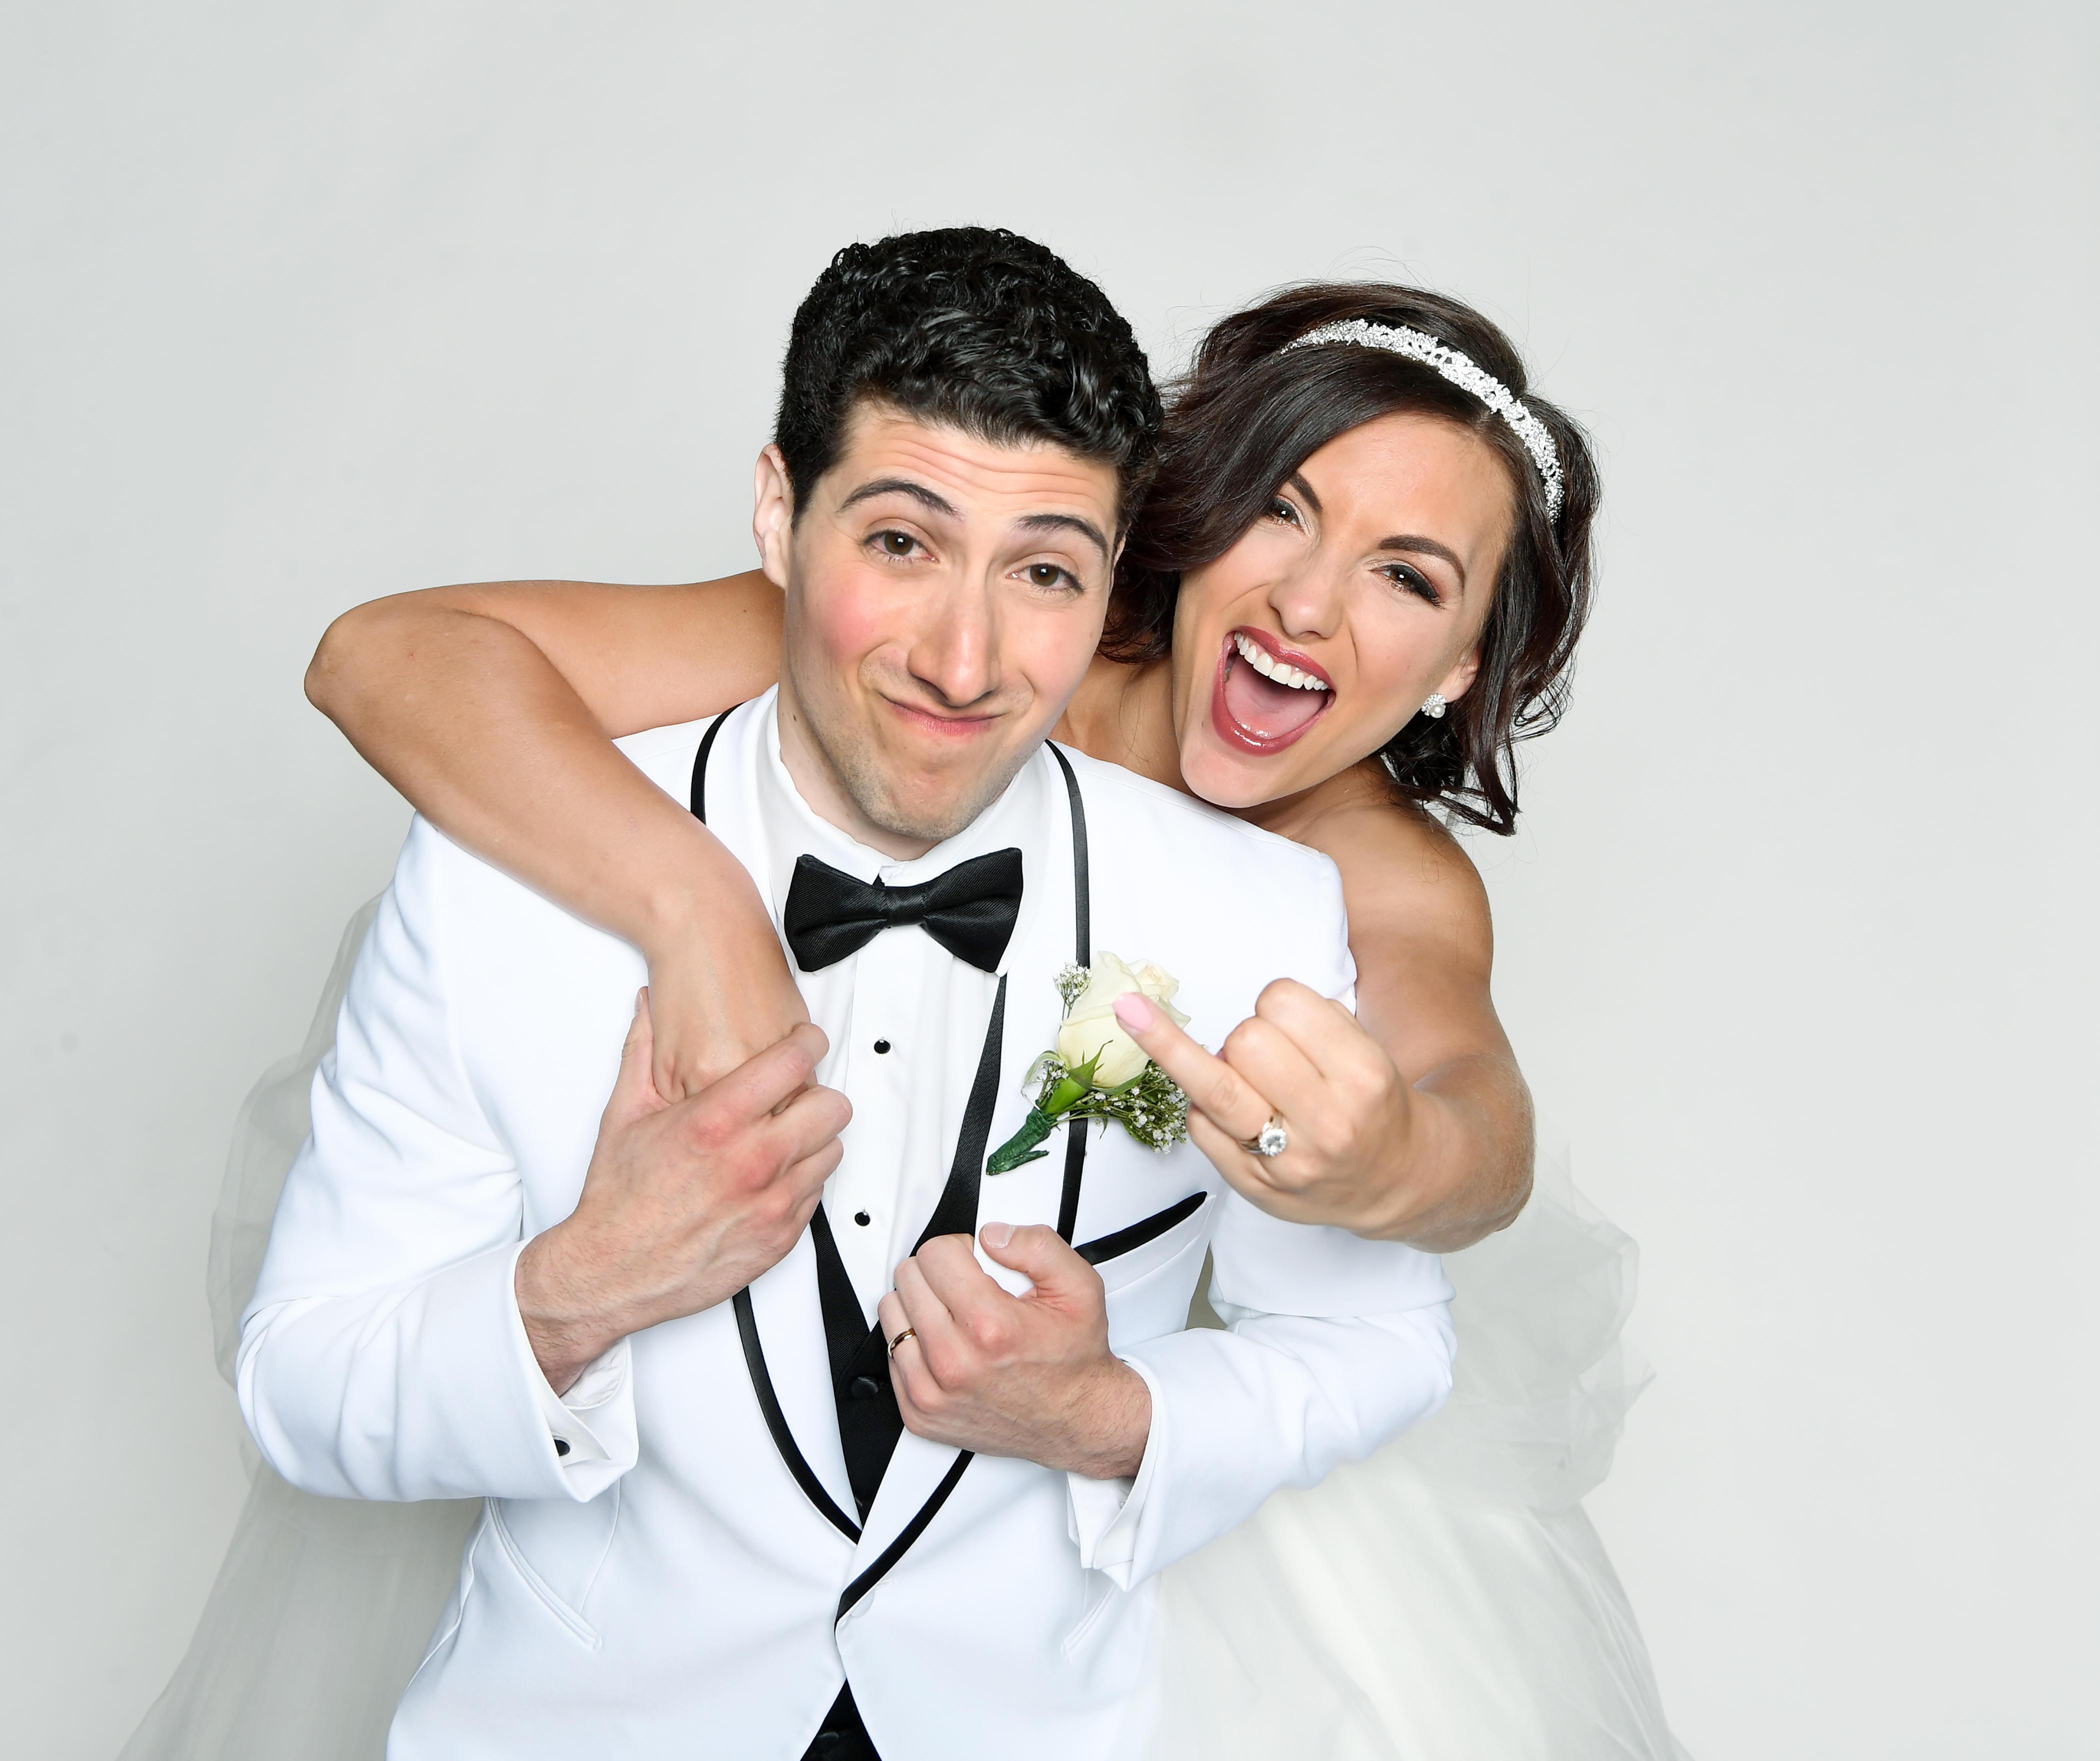 Tony N' Tina's Wedding image 2